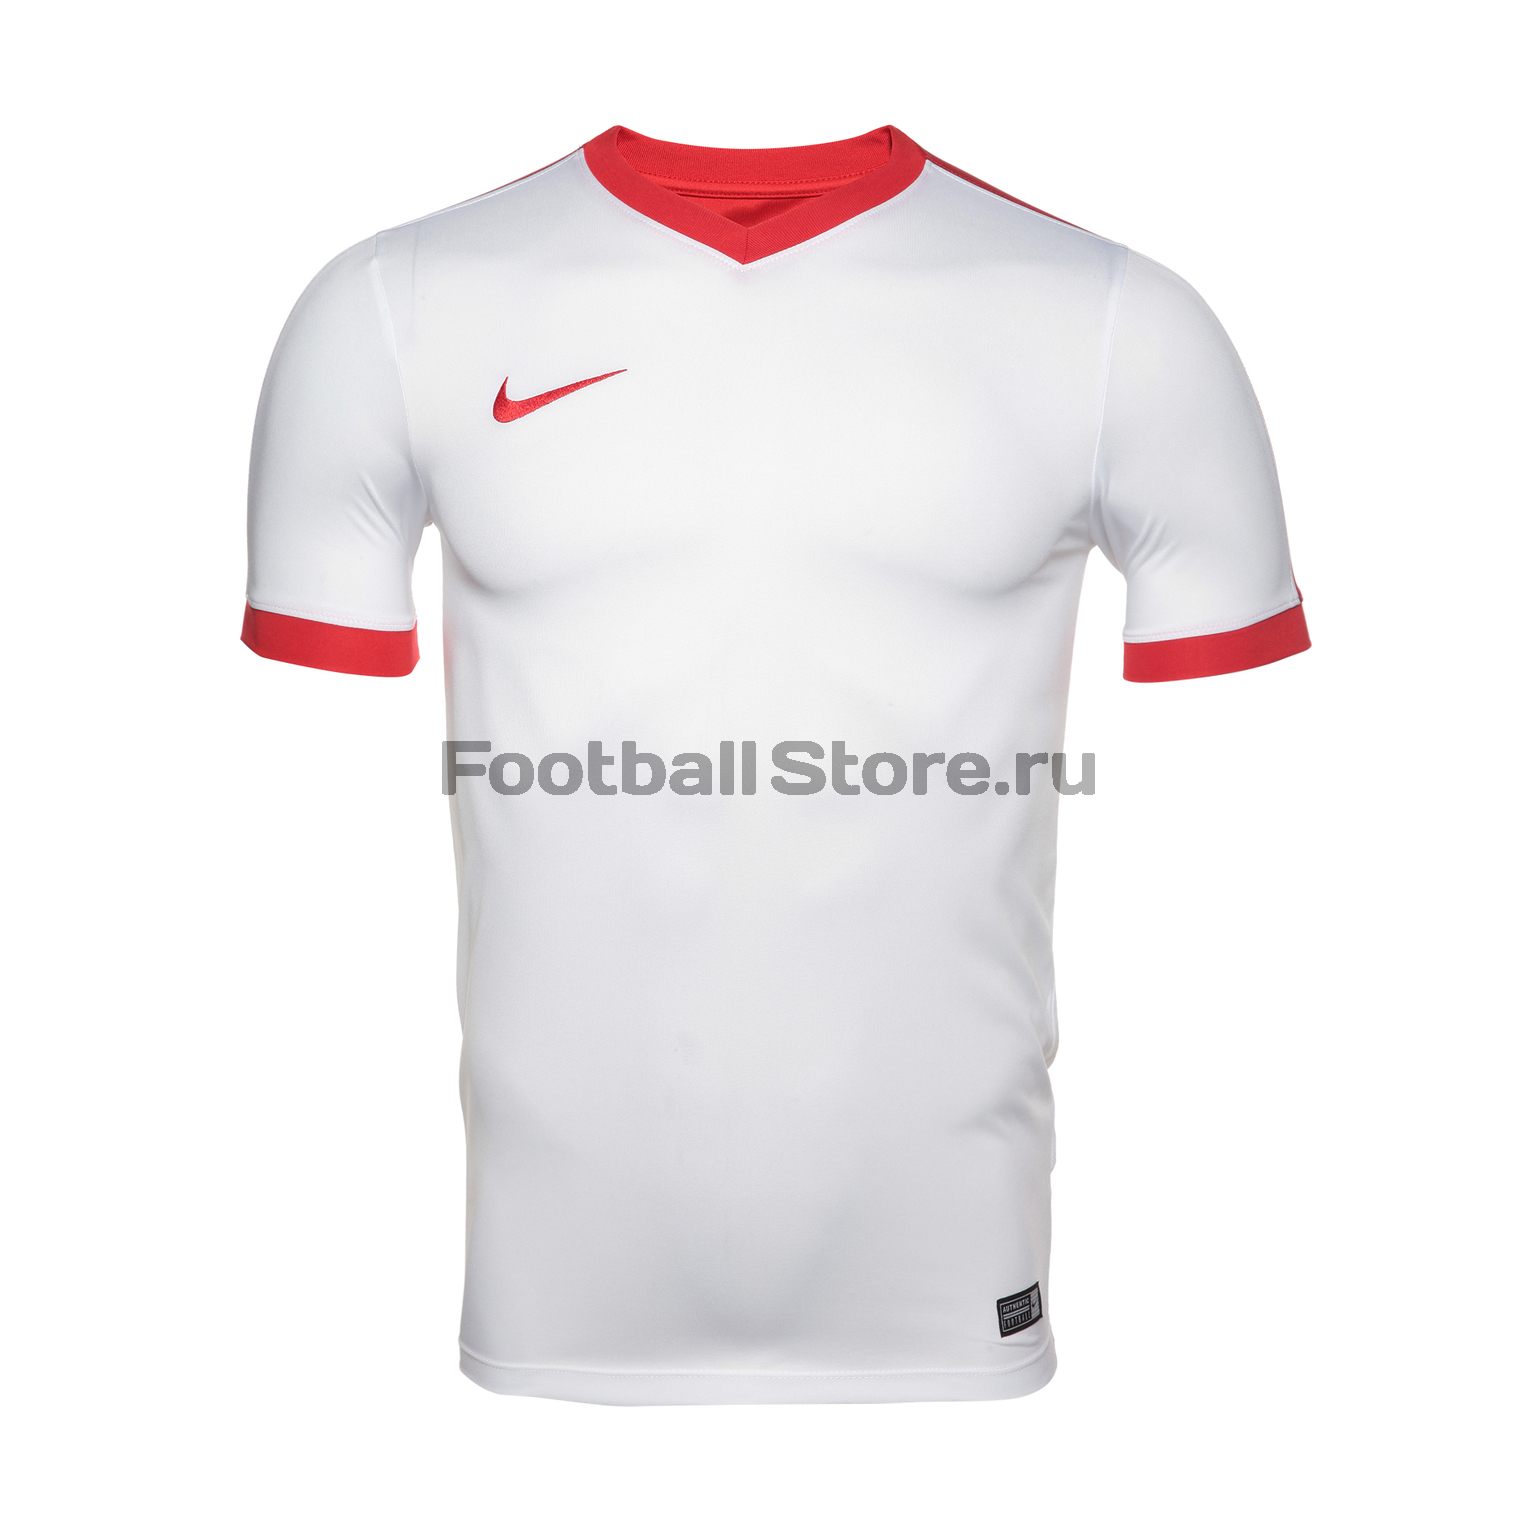 Футболка Nike SS Striker IV JSY 725892-101 nike футболка zenit ss h a stadium jsy